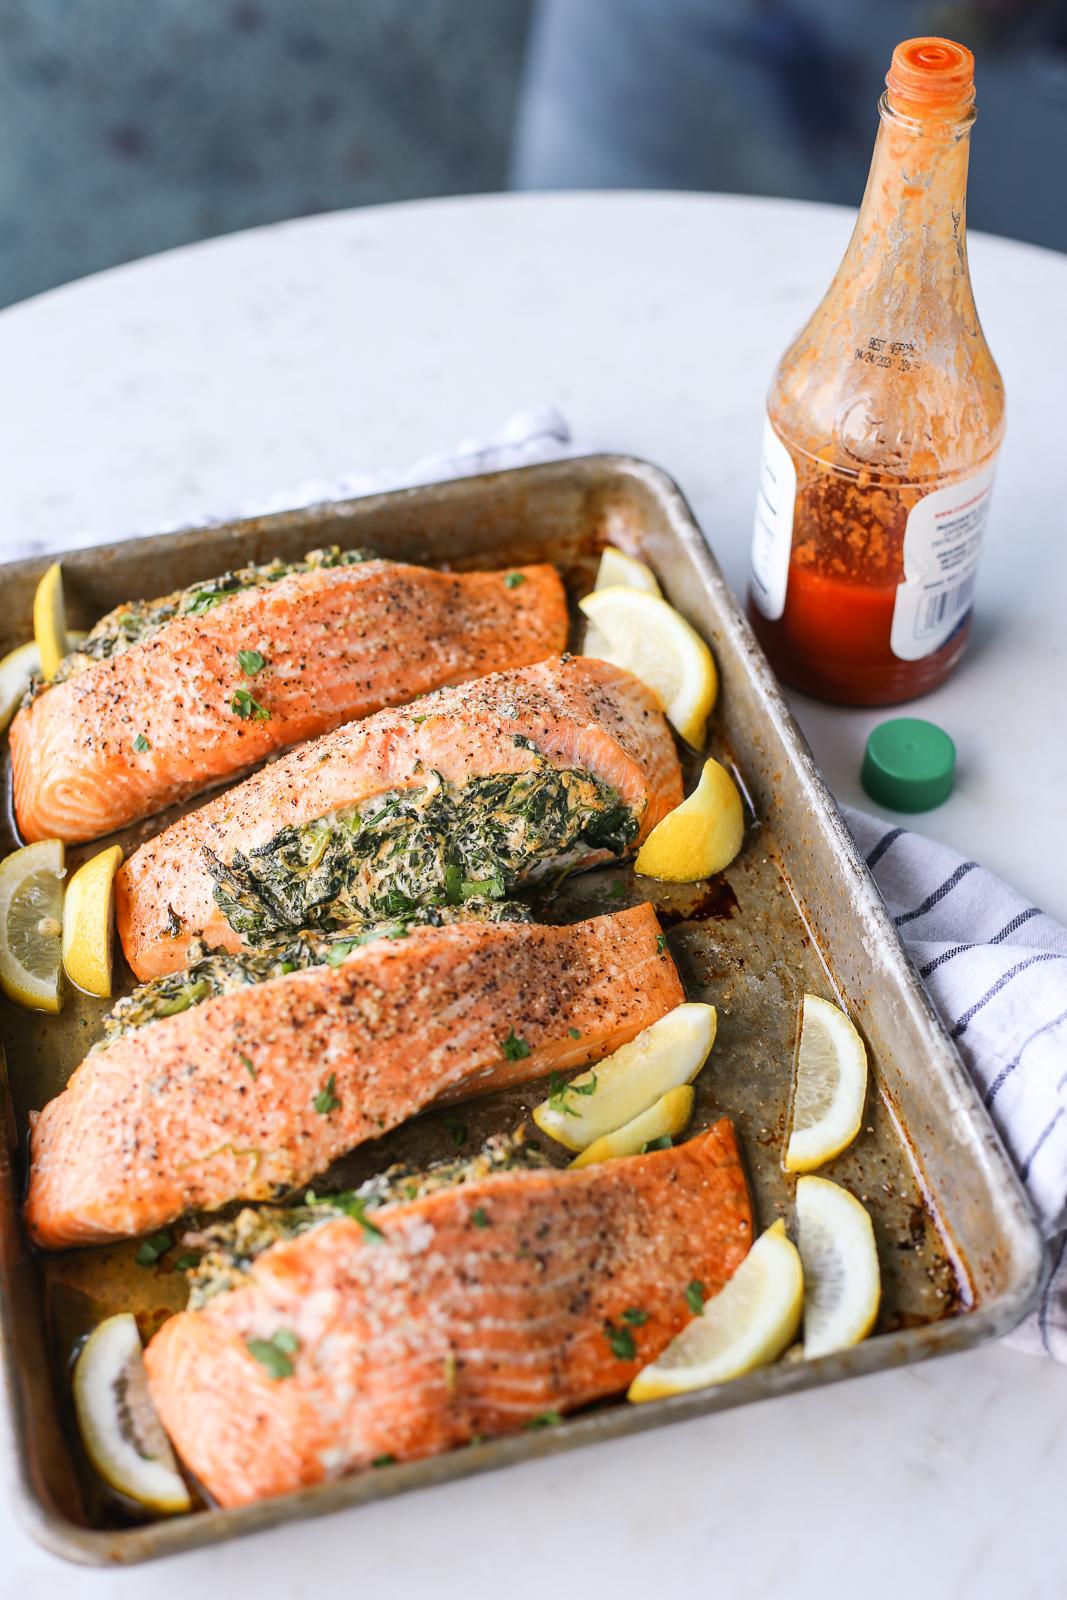 Creamy Spinach Stuffed Salmon